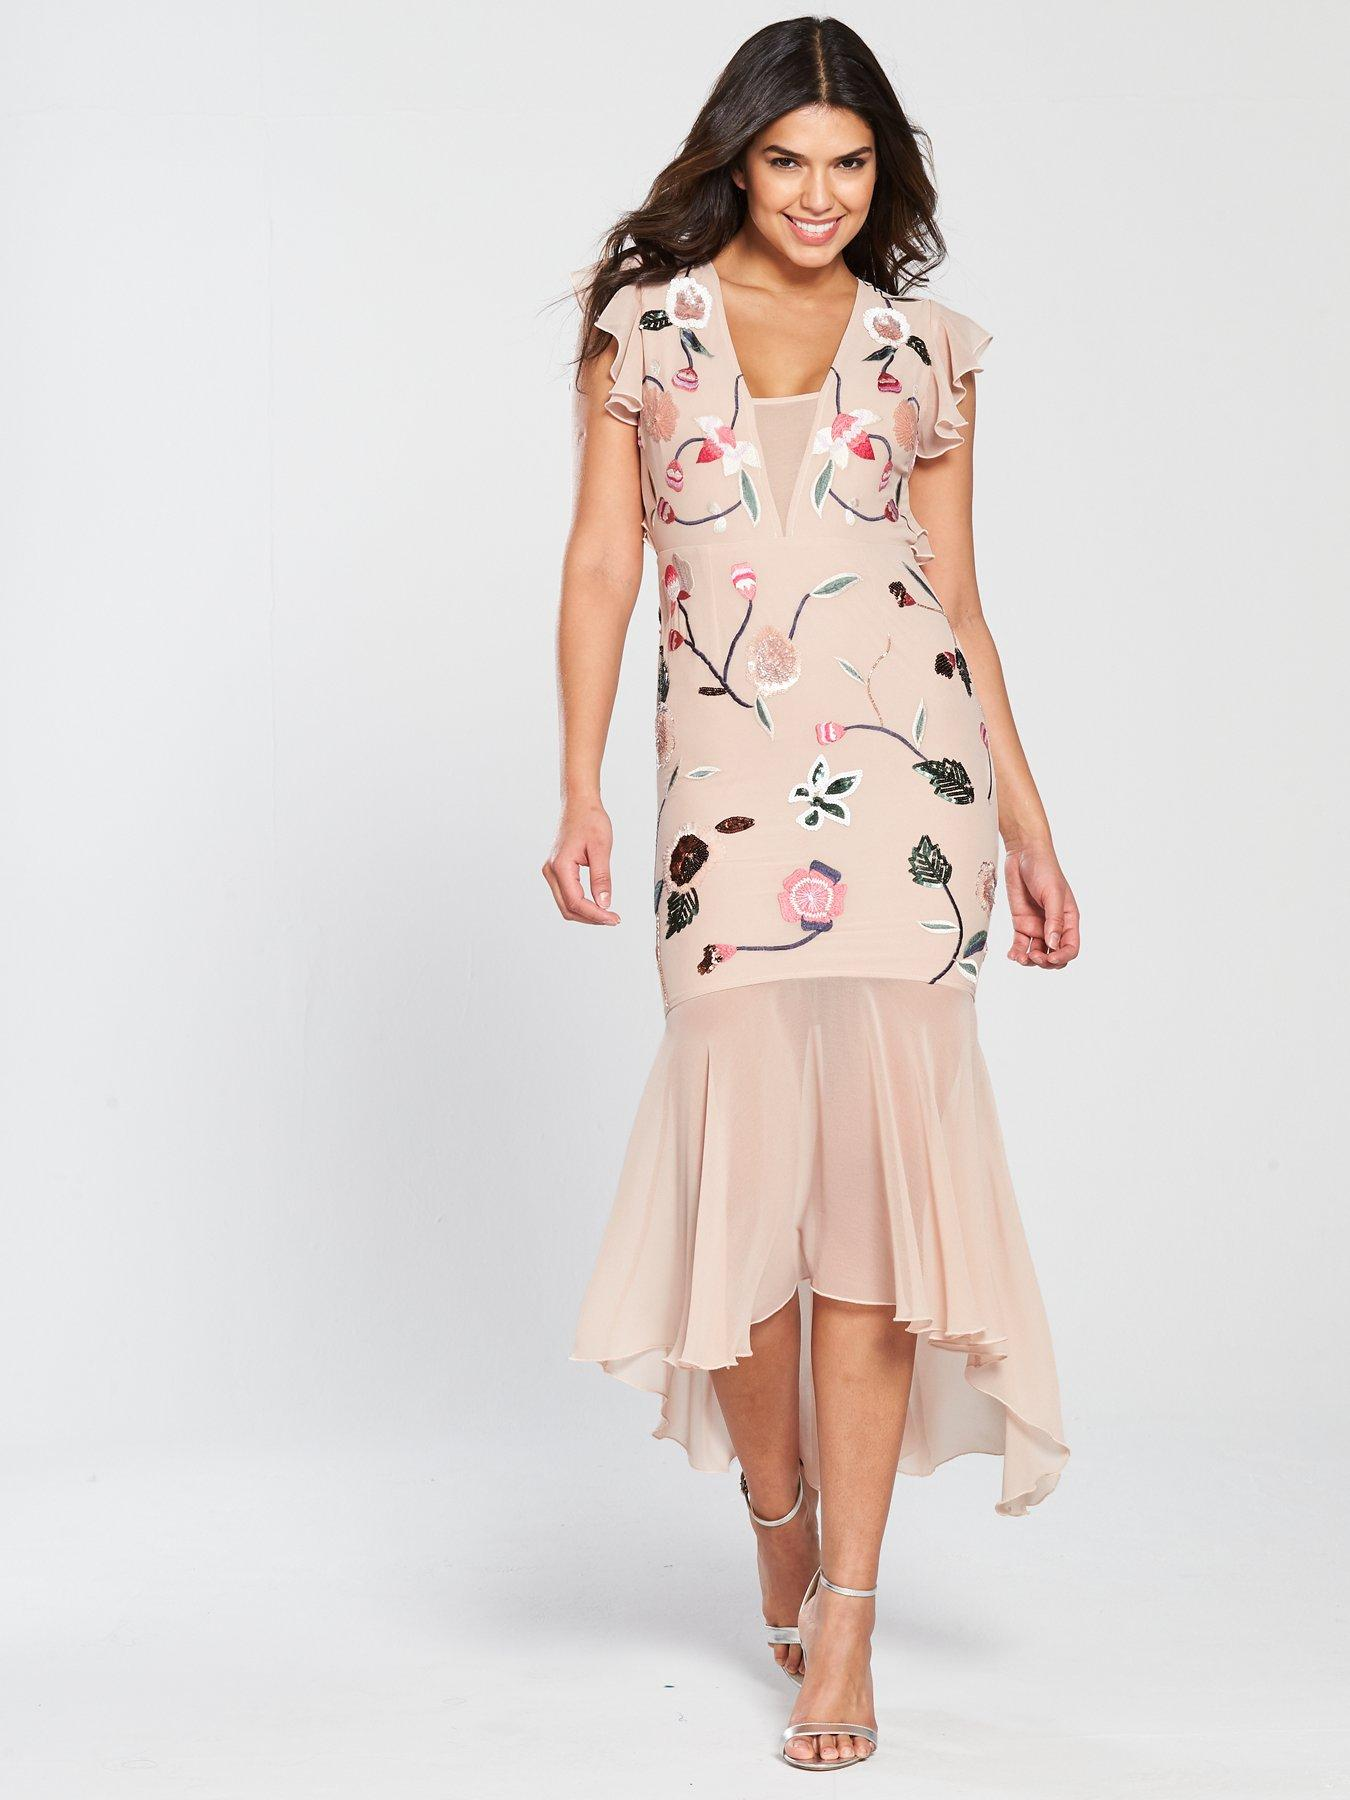 Maxi dresses uk